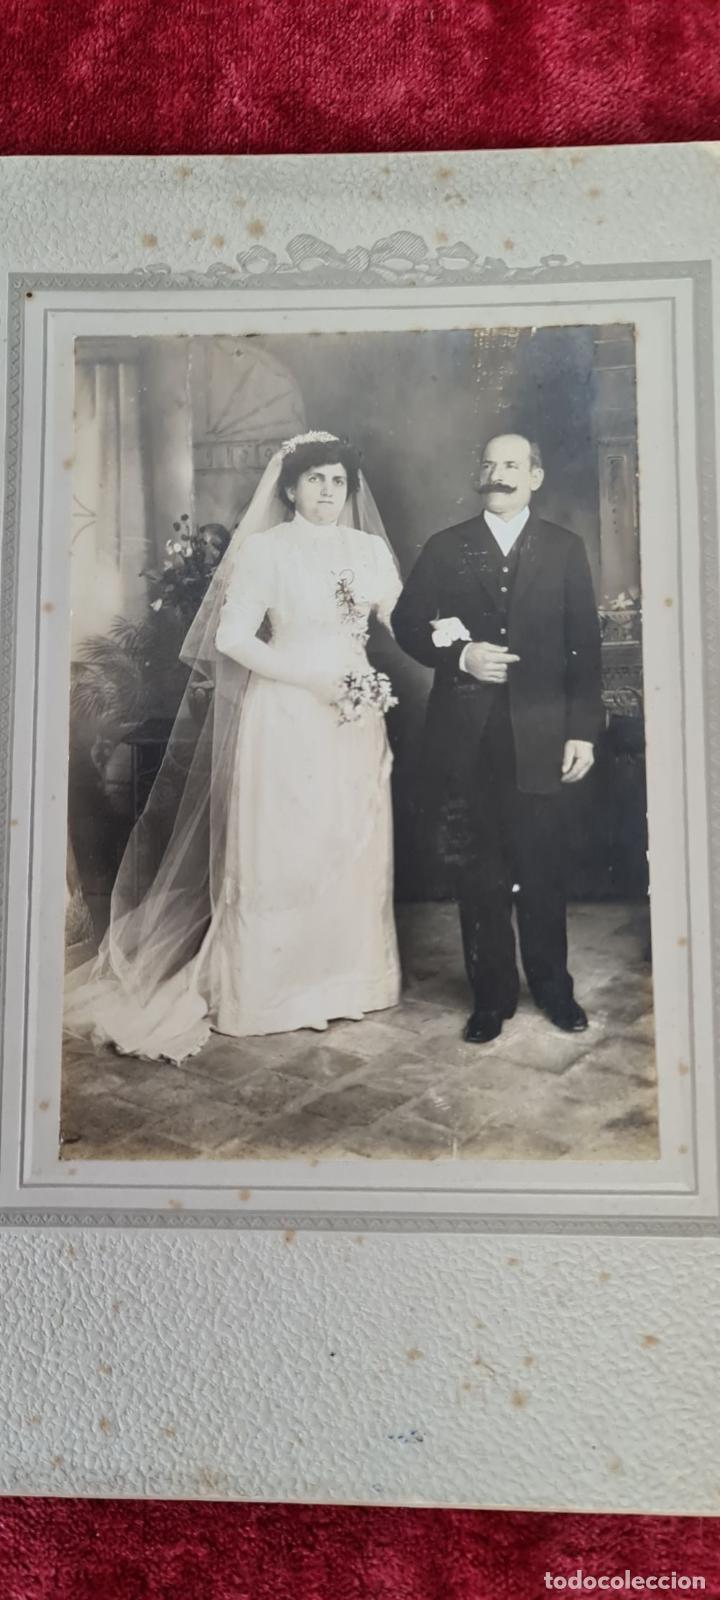 Fotografía antigua: COLECCIÓN DE 10 FOTOGRAFIAS FAMILIARES. ALBUMINA. CUBA. 1910. - Foto 4 - 210548423